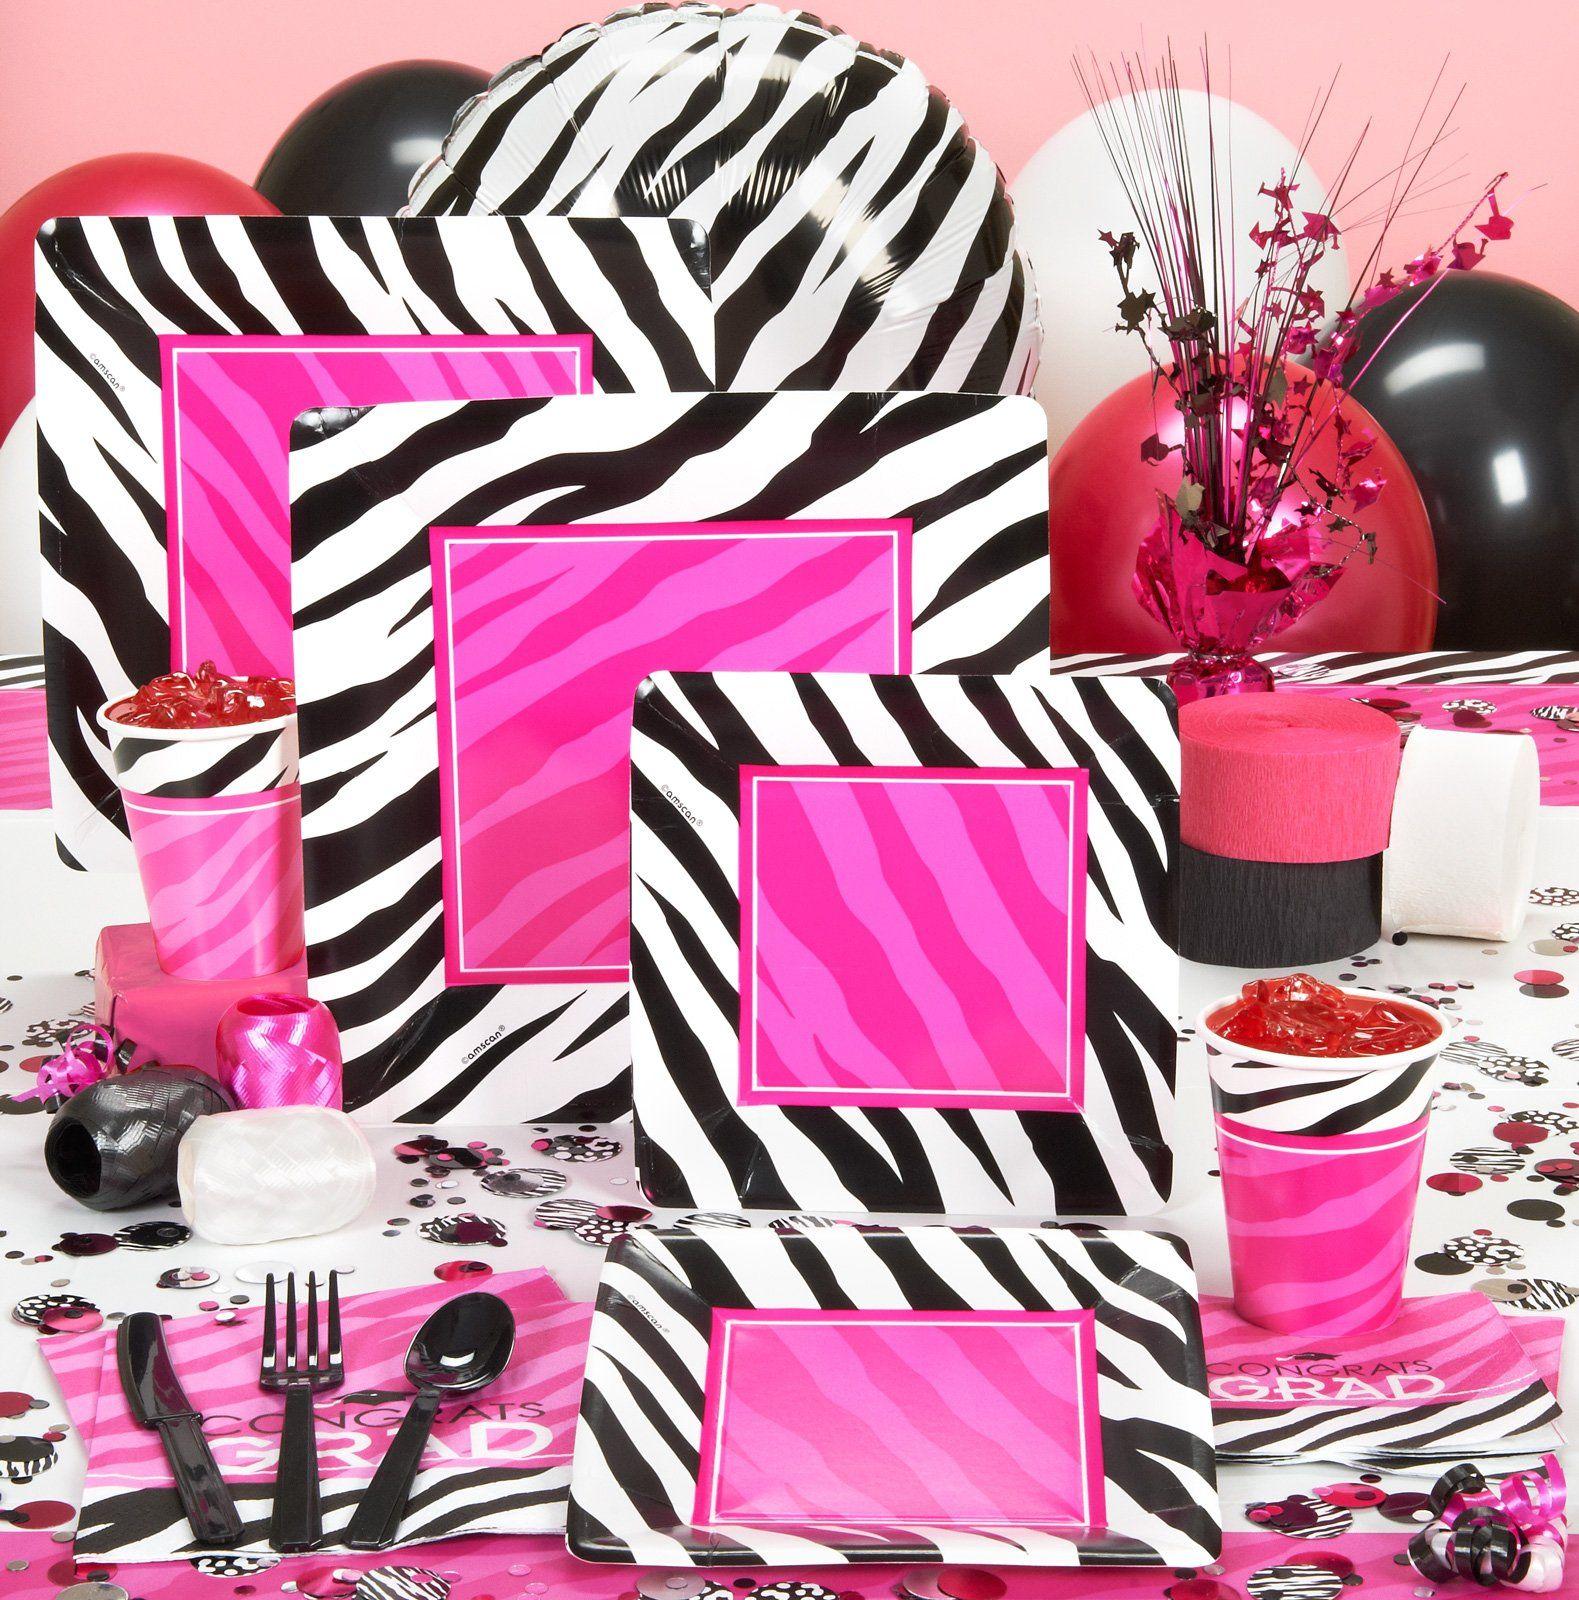 Zebra Graduation Party Supplies 81415 Slumber Party Birthday